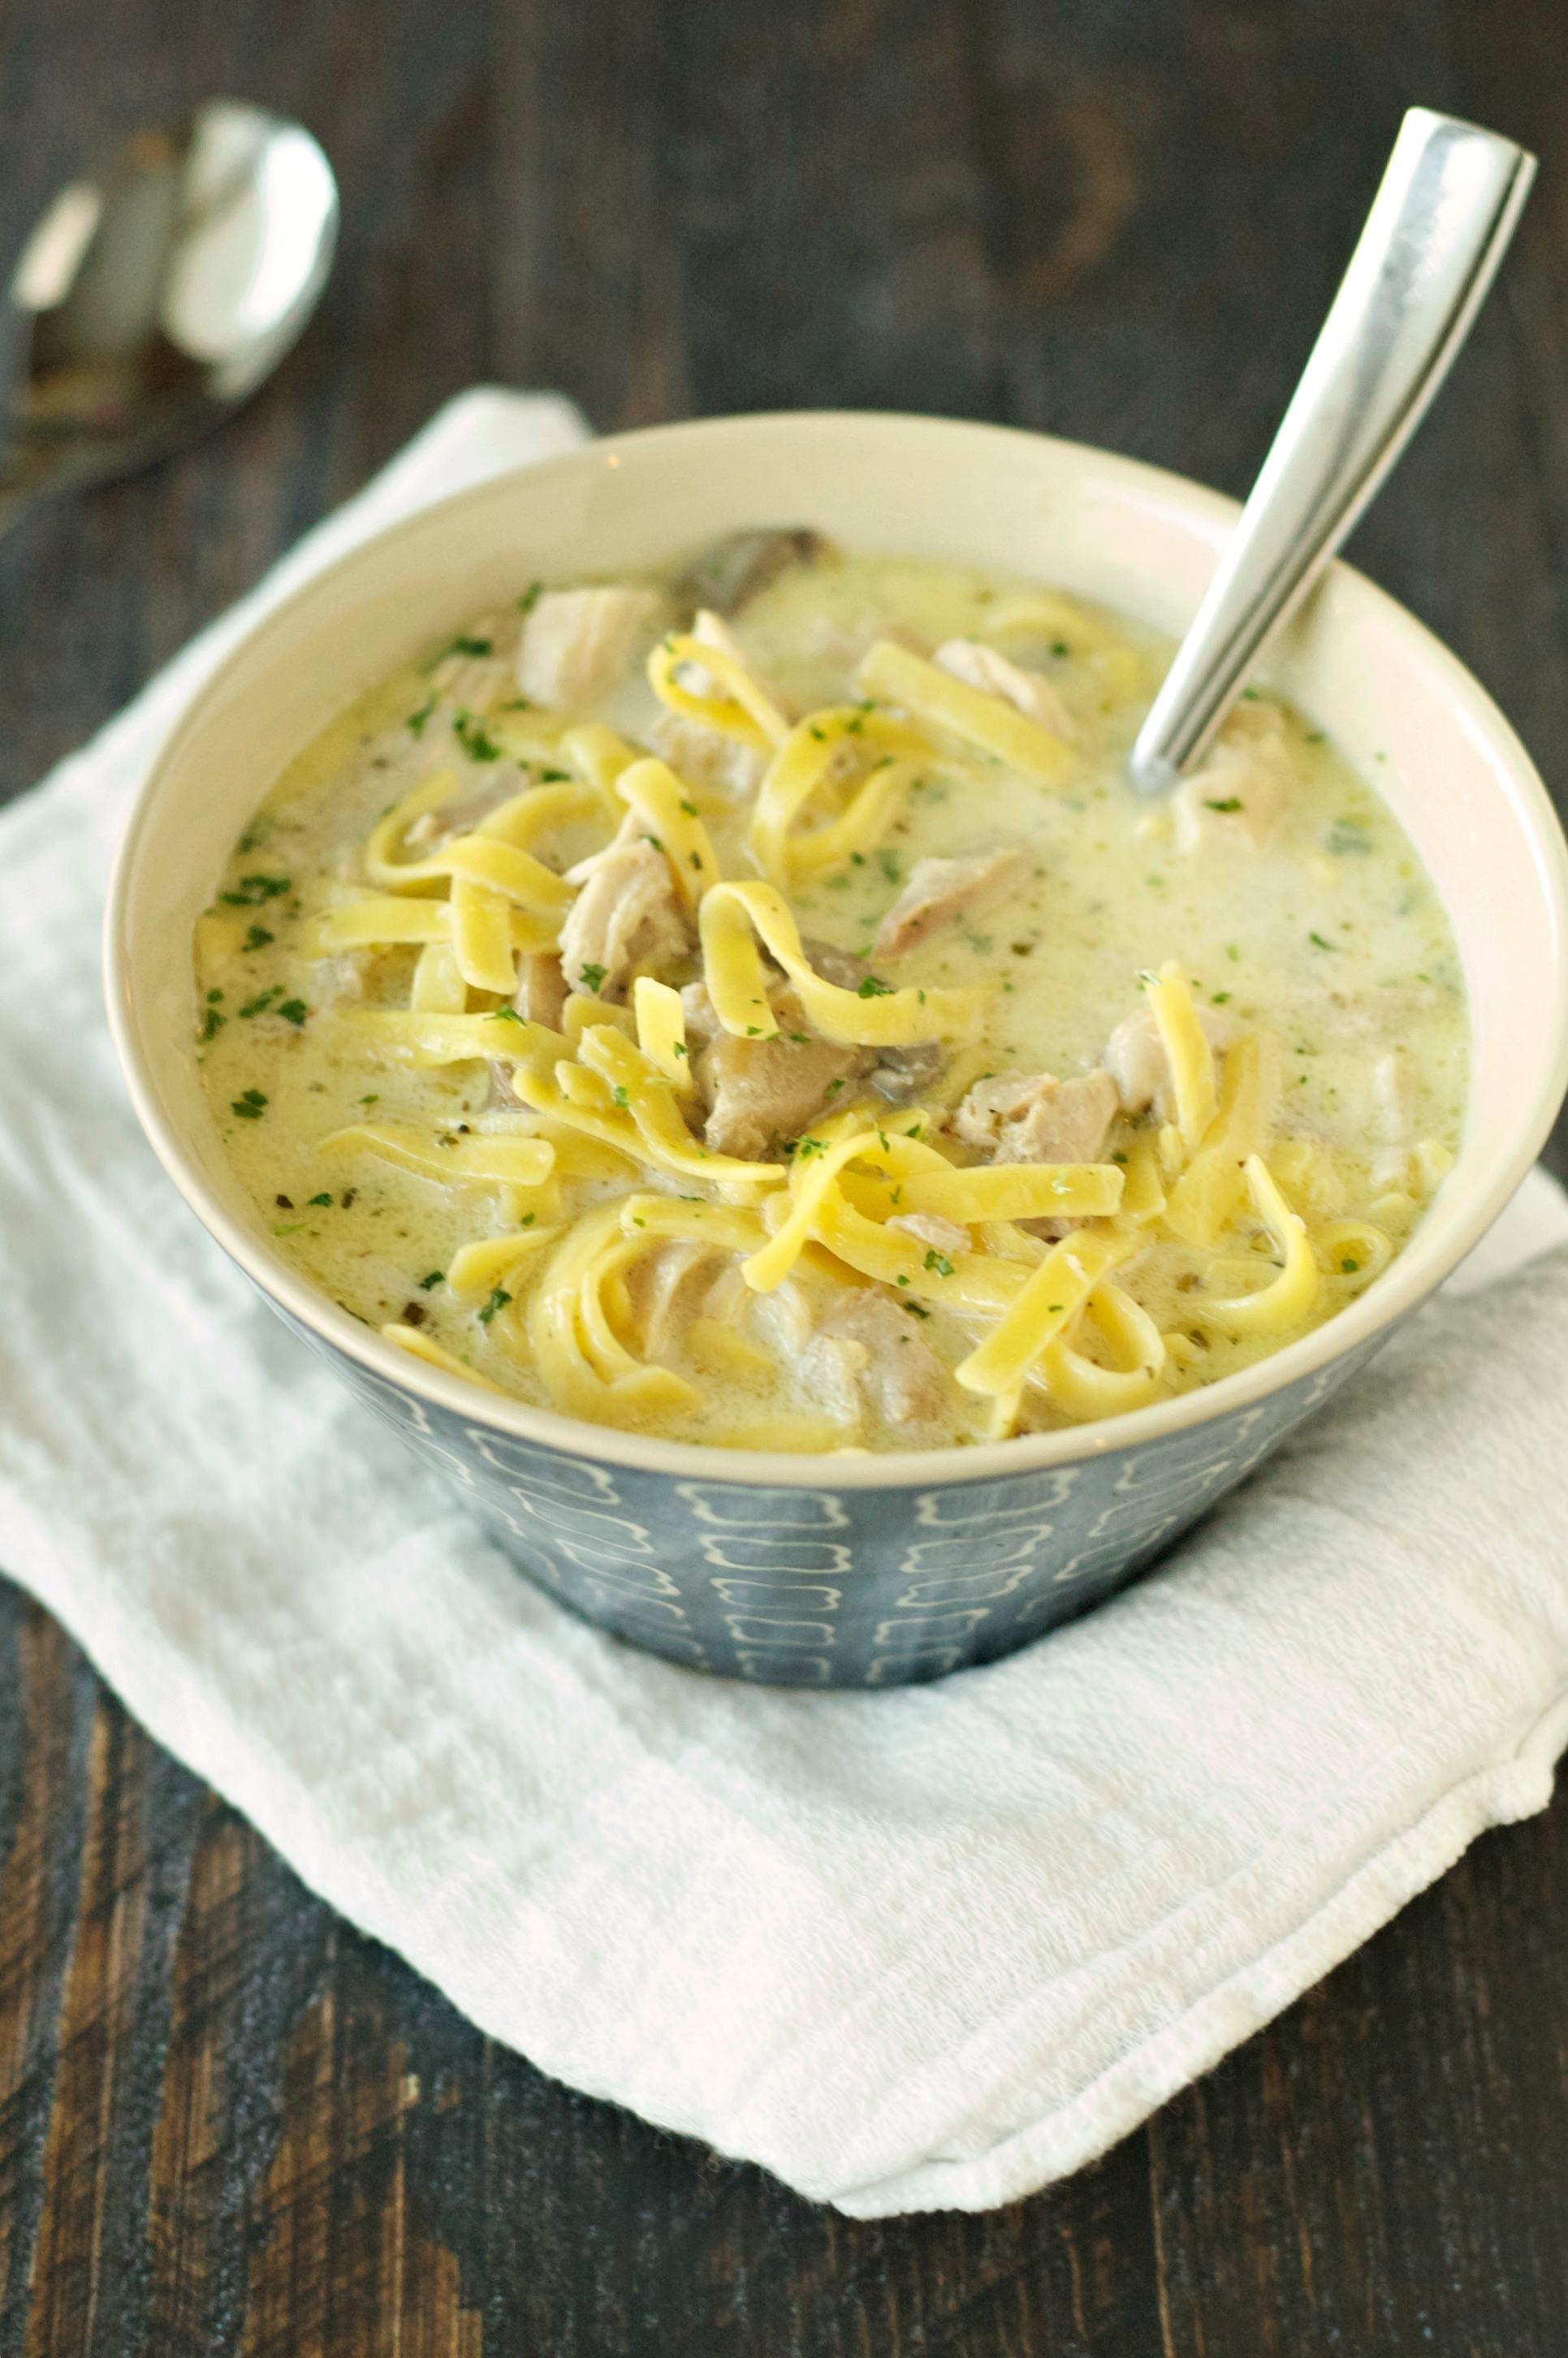 Creamy Chicken Soup Recipe  Slow Cooker Creamy Chicken Noodle Soup Slow Cooker Gourmet